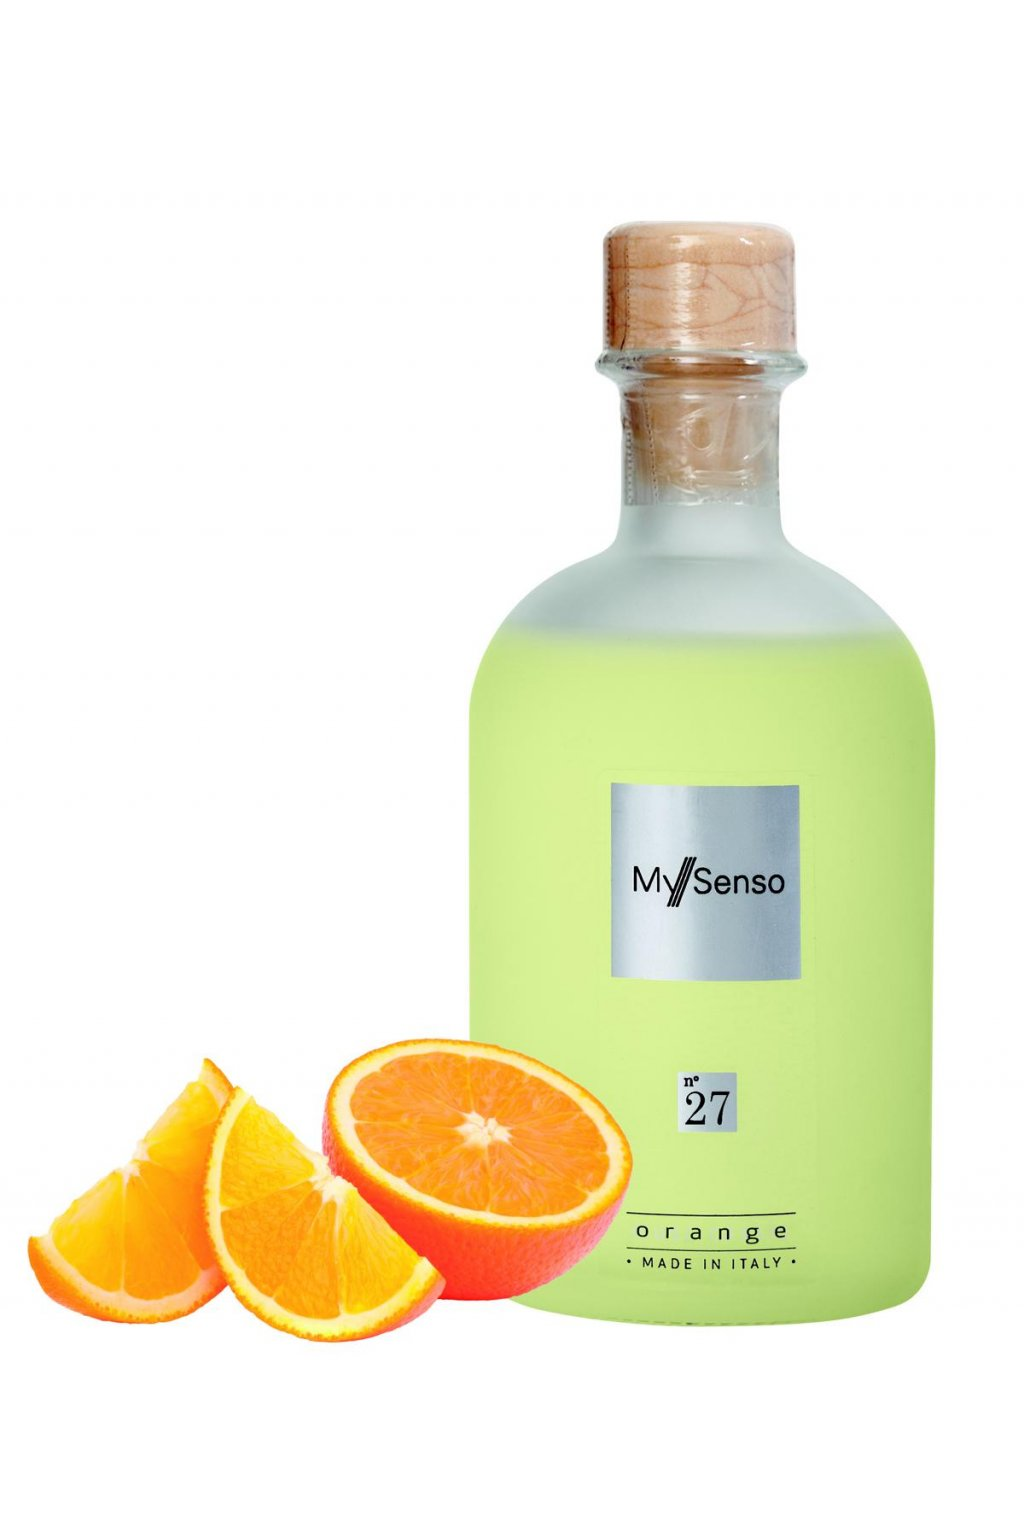 186 my senso nahradni napln pro aromaticky difuzer n 27 orange pomeranc 240ml